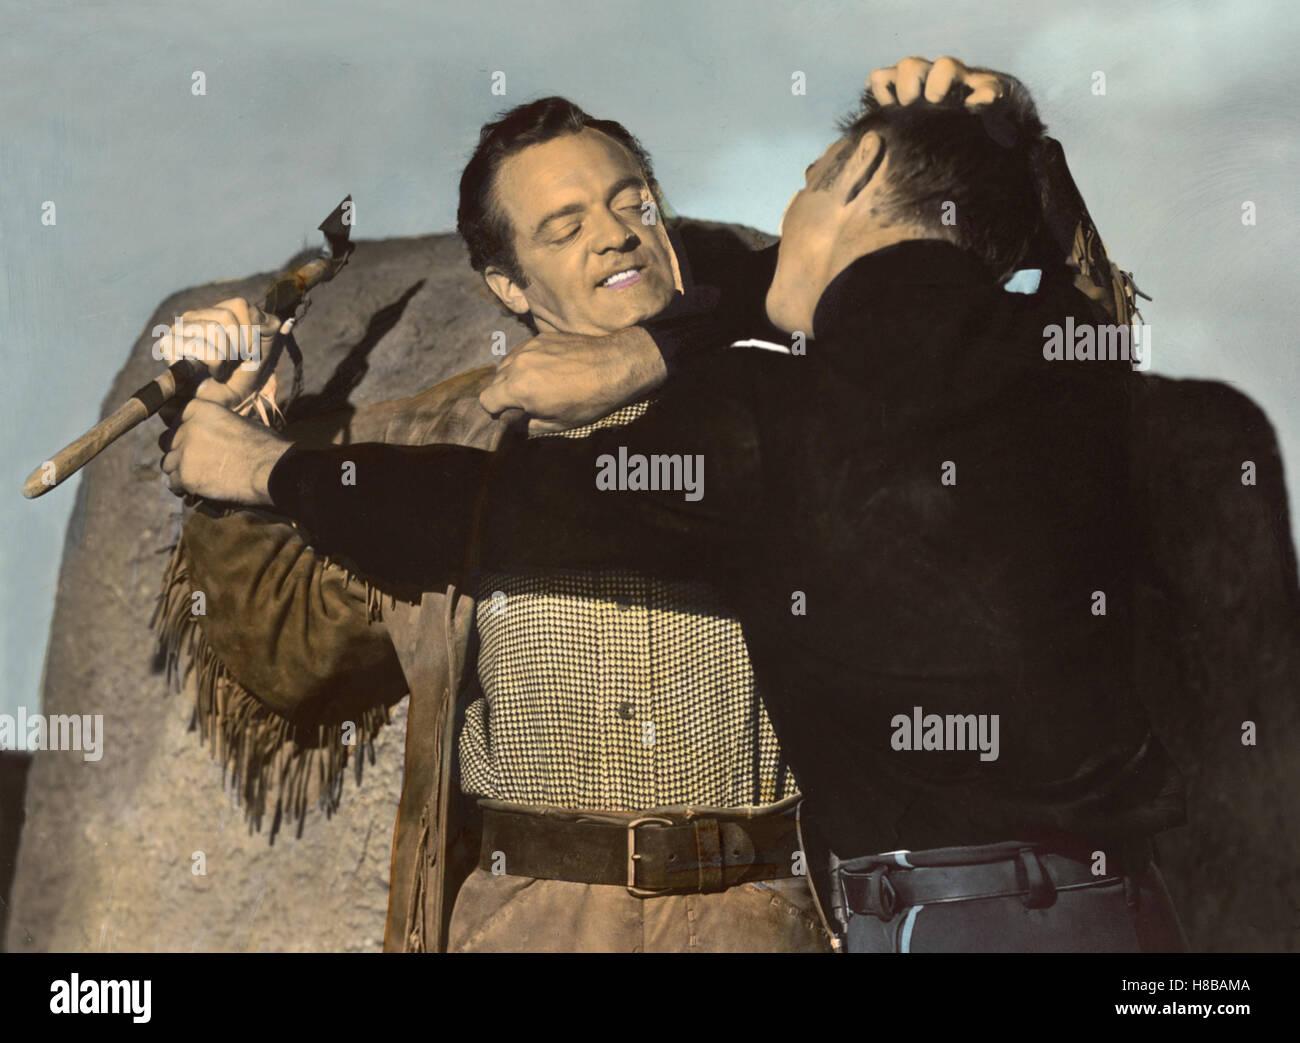 Tomahawk - Aufstand der Sioux, (TOMAHAWK) USA 1951, Regie: George Sherman, VAN HEFLIN,  ALEX NICOL; Key: Western, - Stock Image